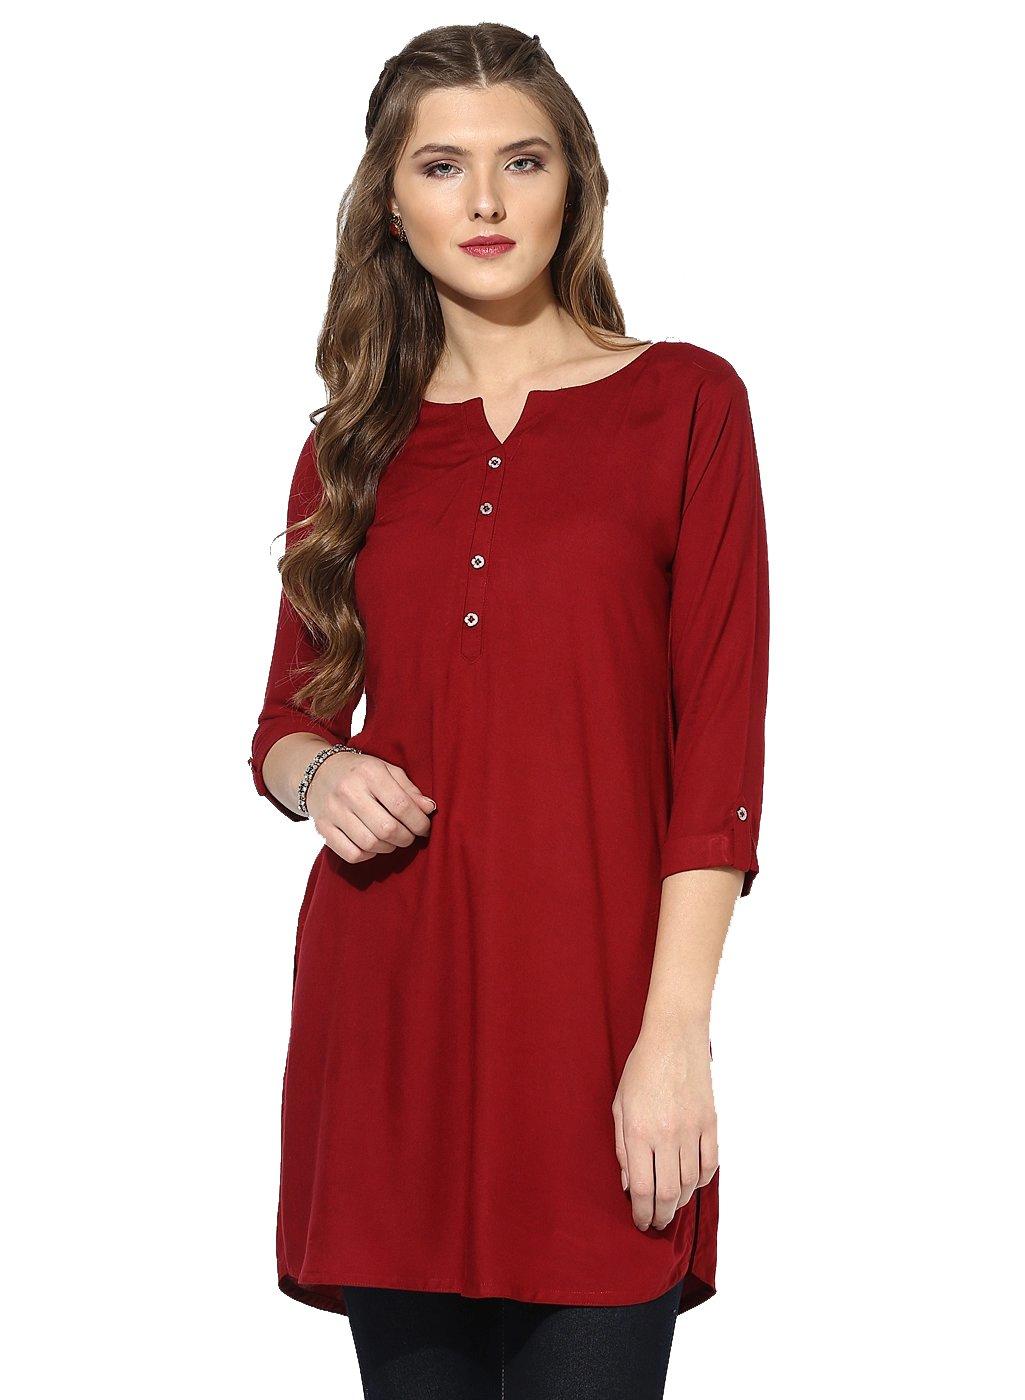 Aahwan Indian Kurtis for Women Maroon Solid Rayon Short Straight Half Sleeve Hip Long Tunic